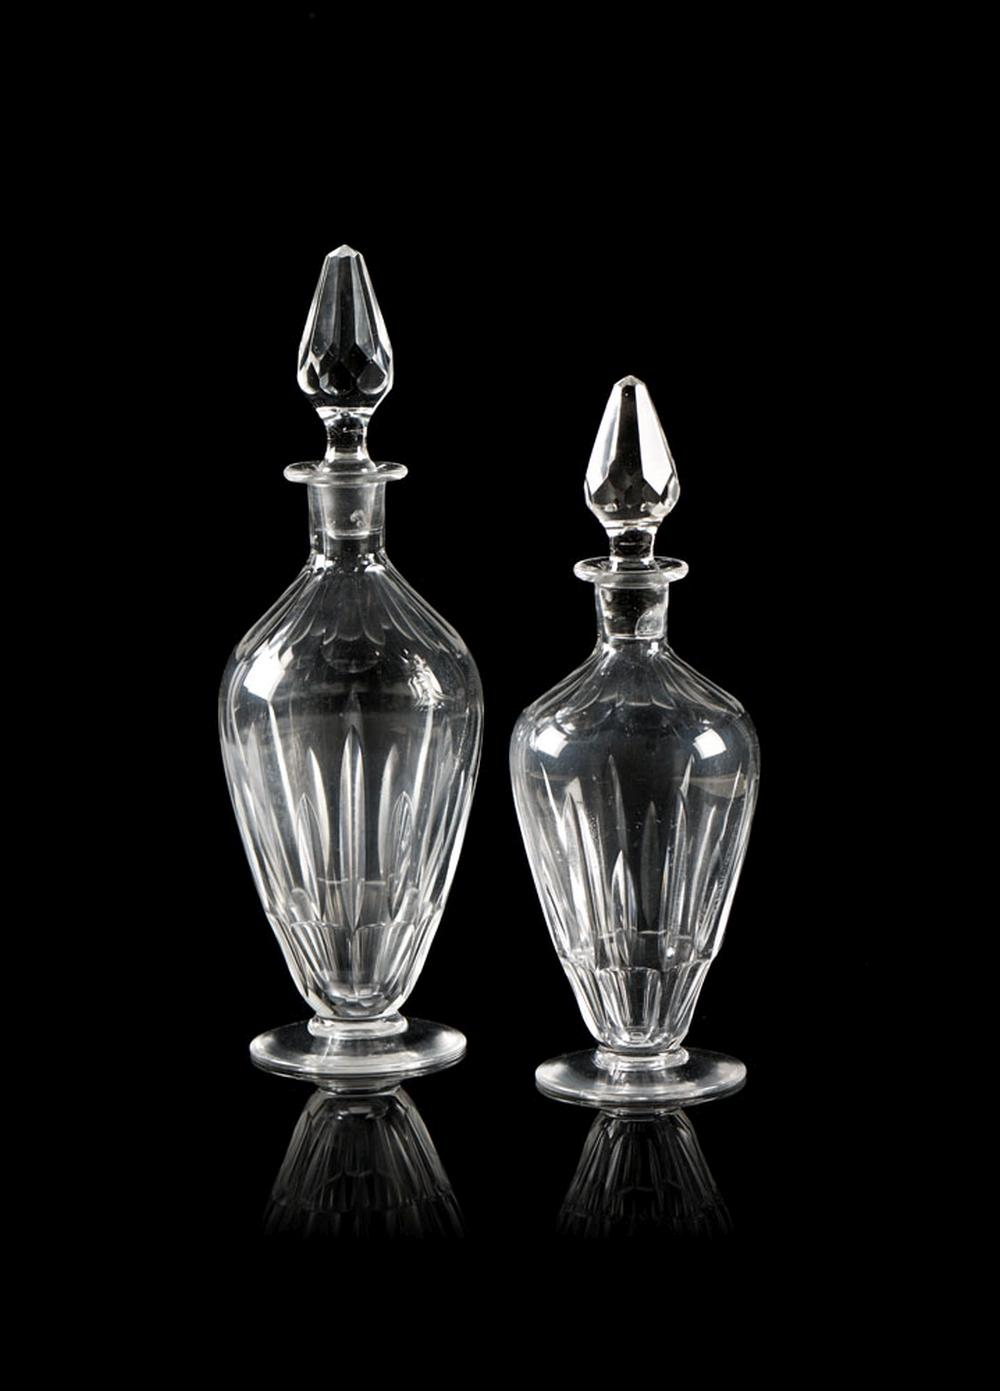 Lote de 2 garrafas de cristal (2)